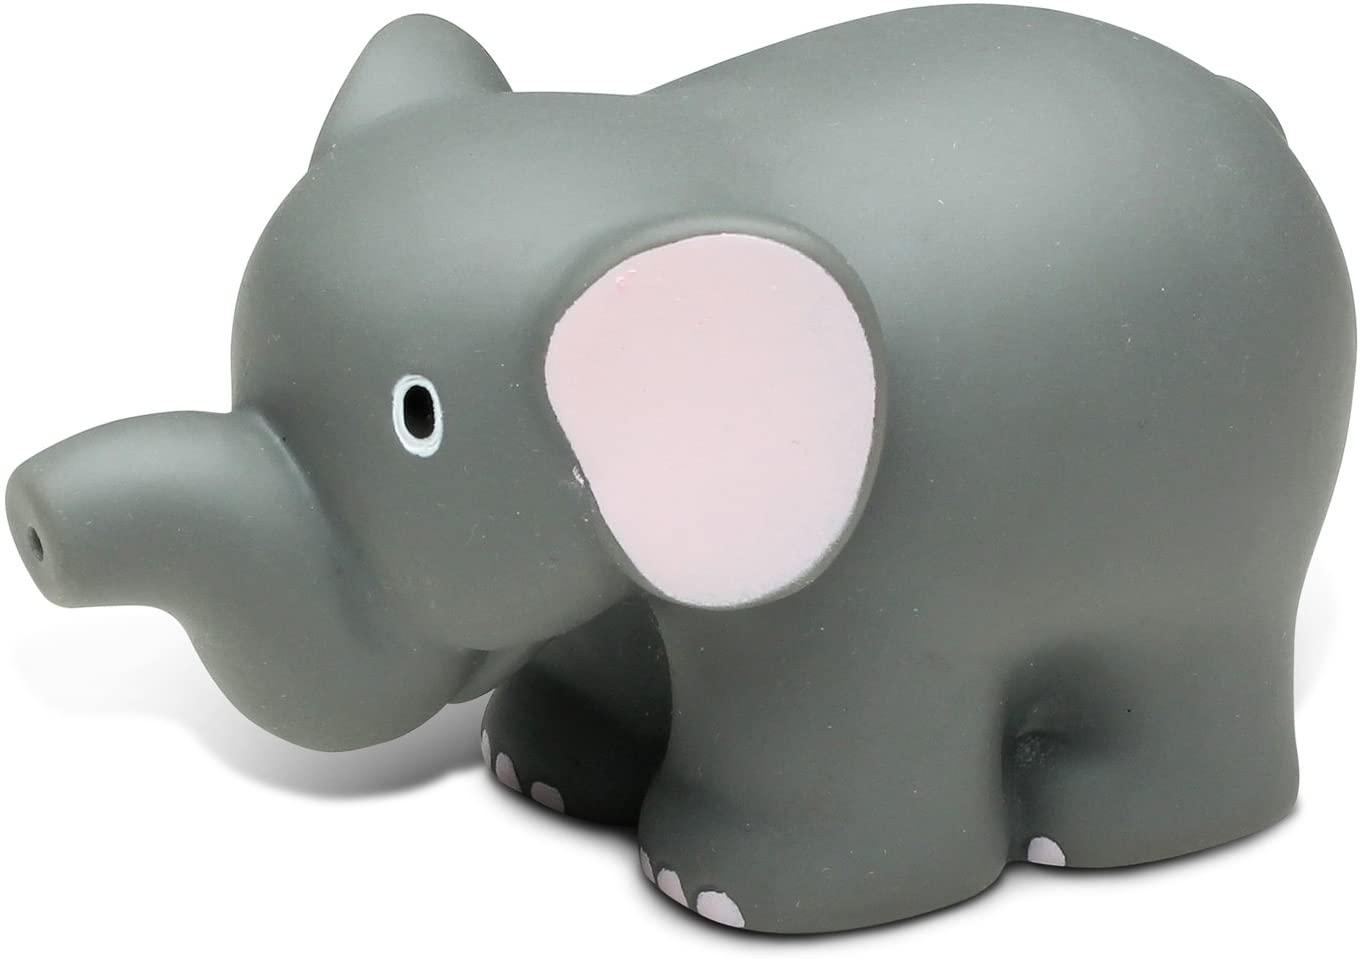 DolliBu Elephant Bath Buddy Squirter - Floating Elephant Rubber Bath Toy, Fun Water Squirting Bathtime Play For Toddlers Cute & Soft Wild Life Animal Toy For The Bathtub, Beach & Pool for Girls & Boys